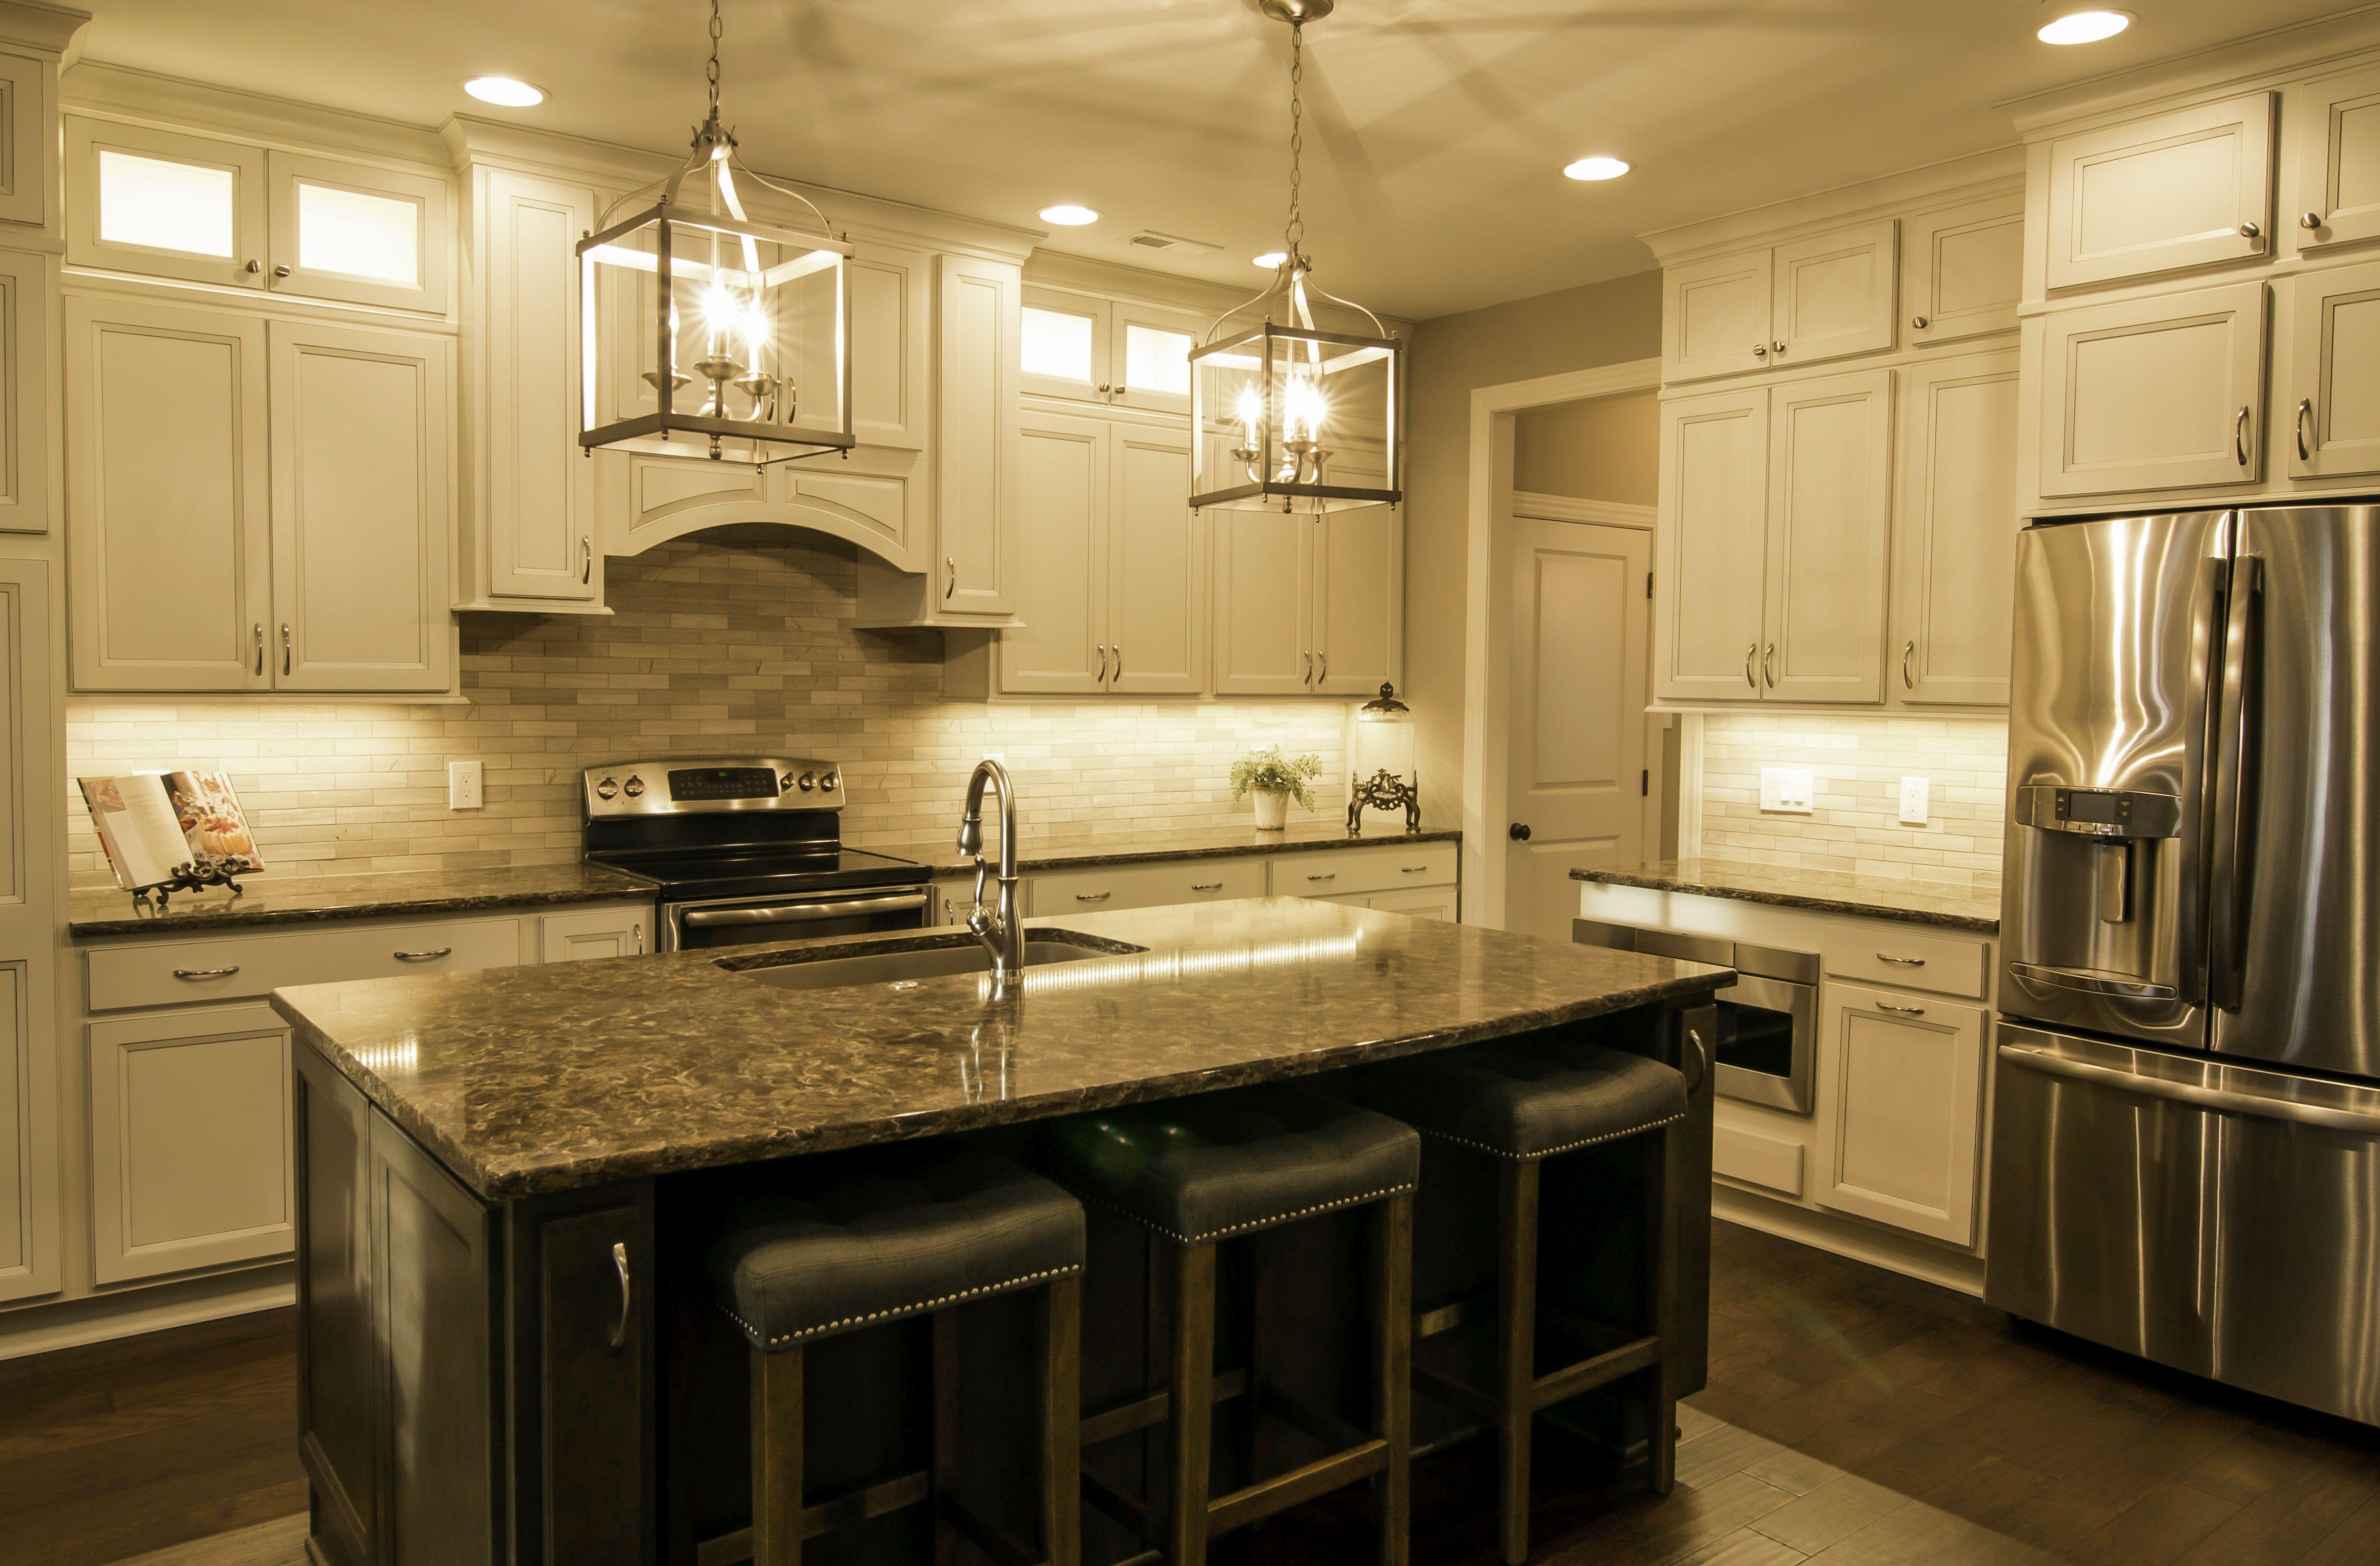 Best Kitchen Gallery: Kitchen Cabi Homecrest Cabi Ry Lautner Maple French of Homecrest Kitchen Cabinets on cal-ite.com